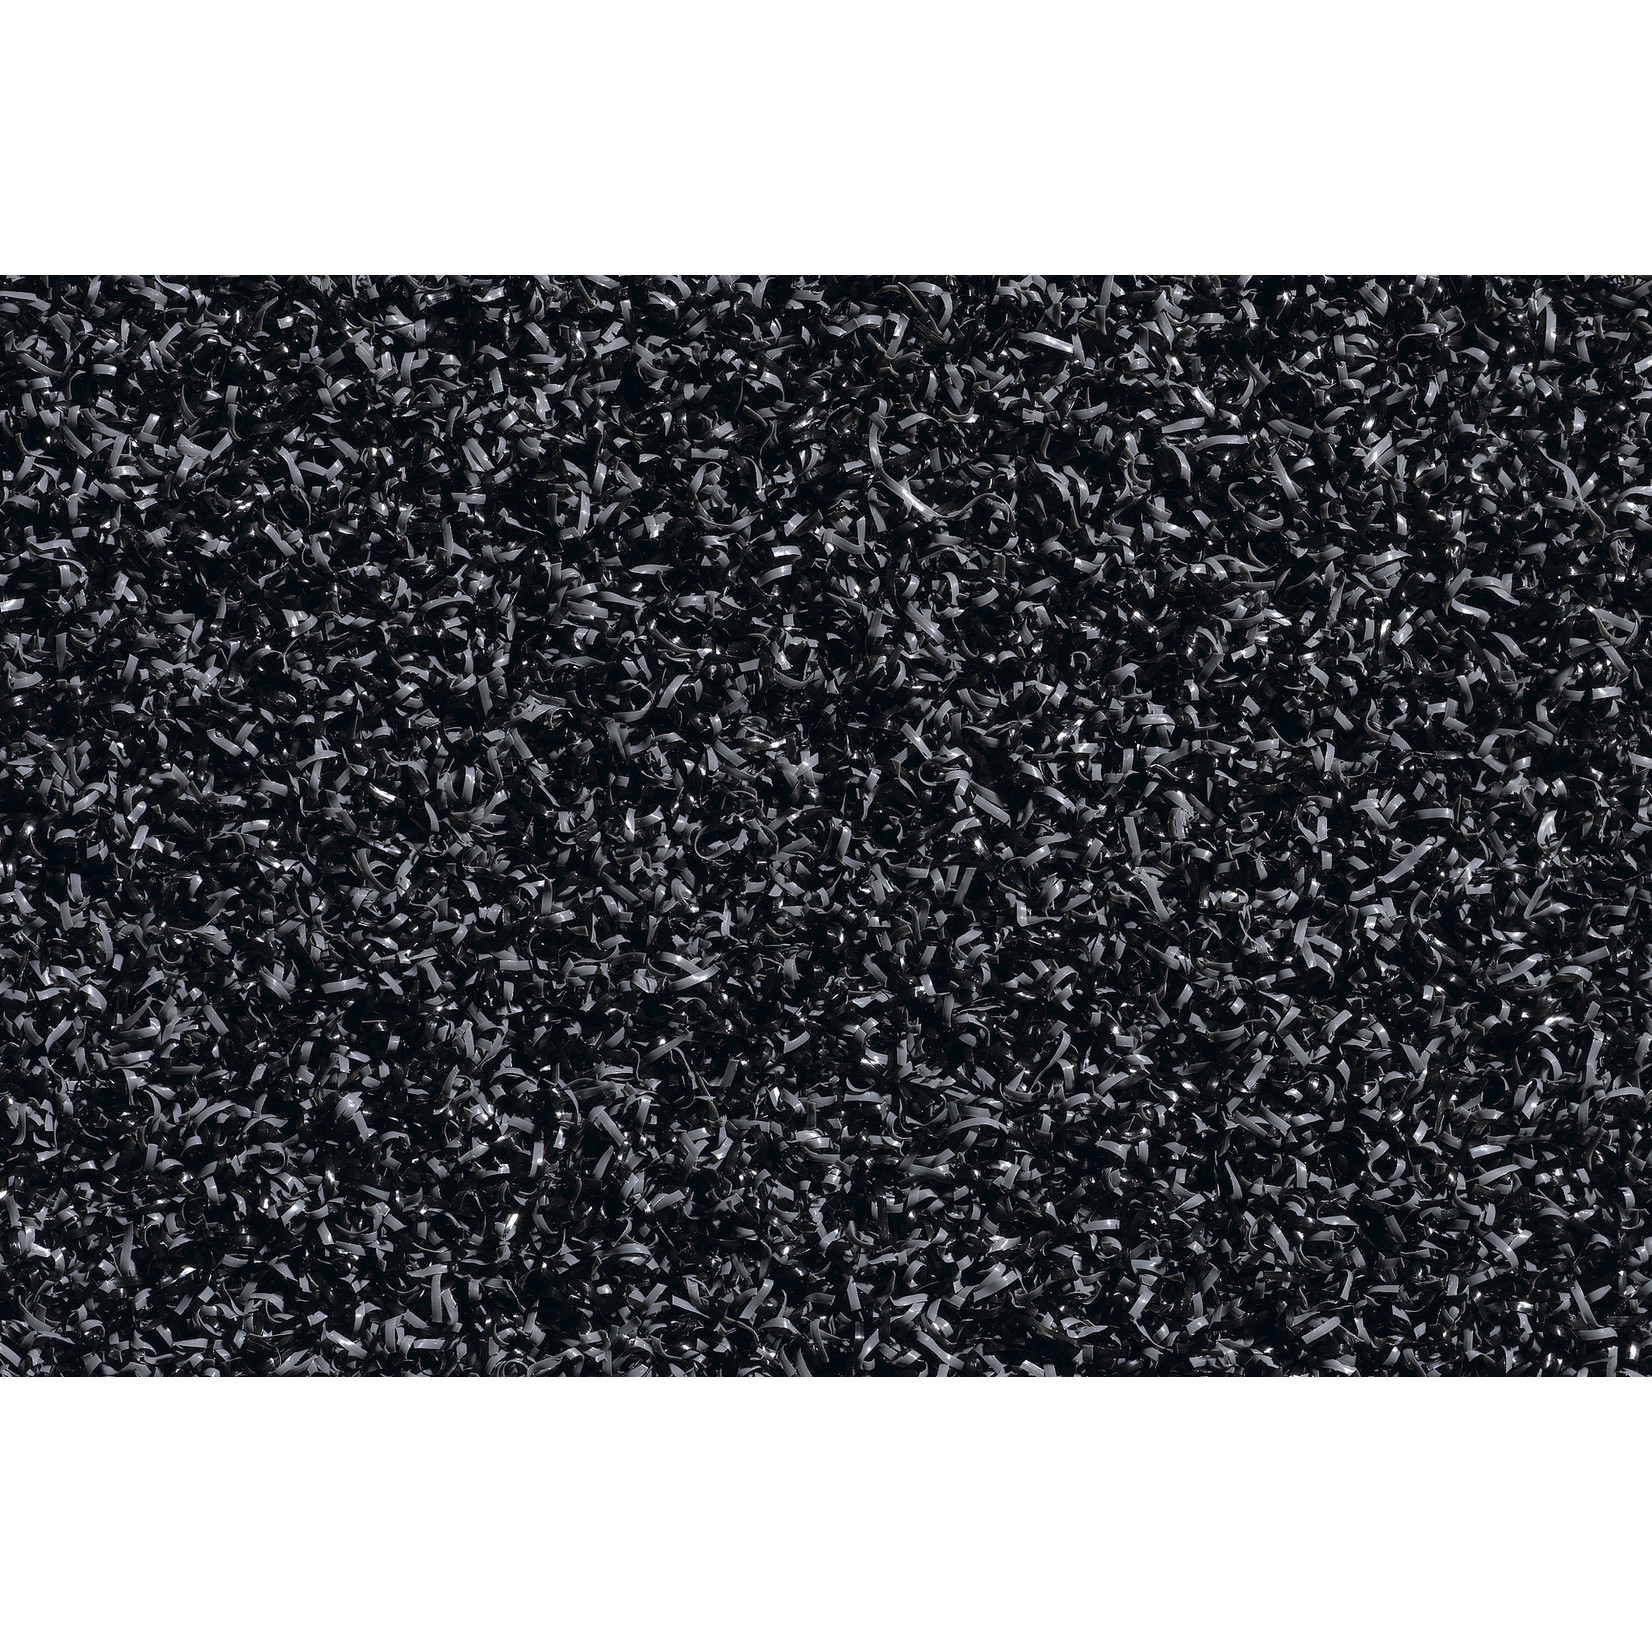 Hamat Dimension Antraciet (uni) 50x80cm